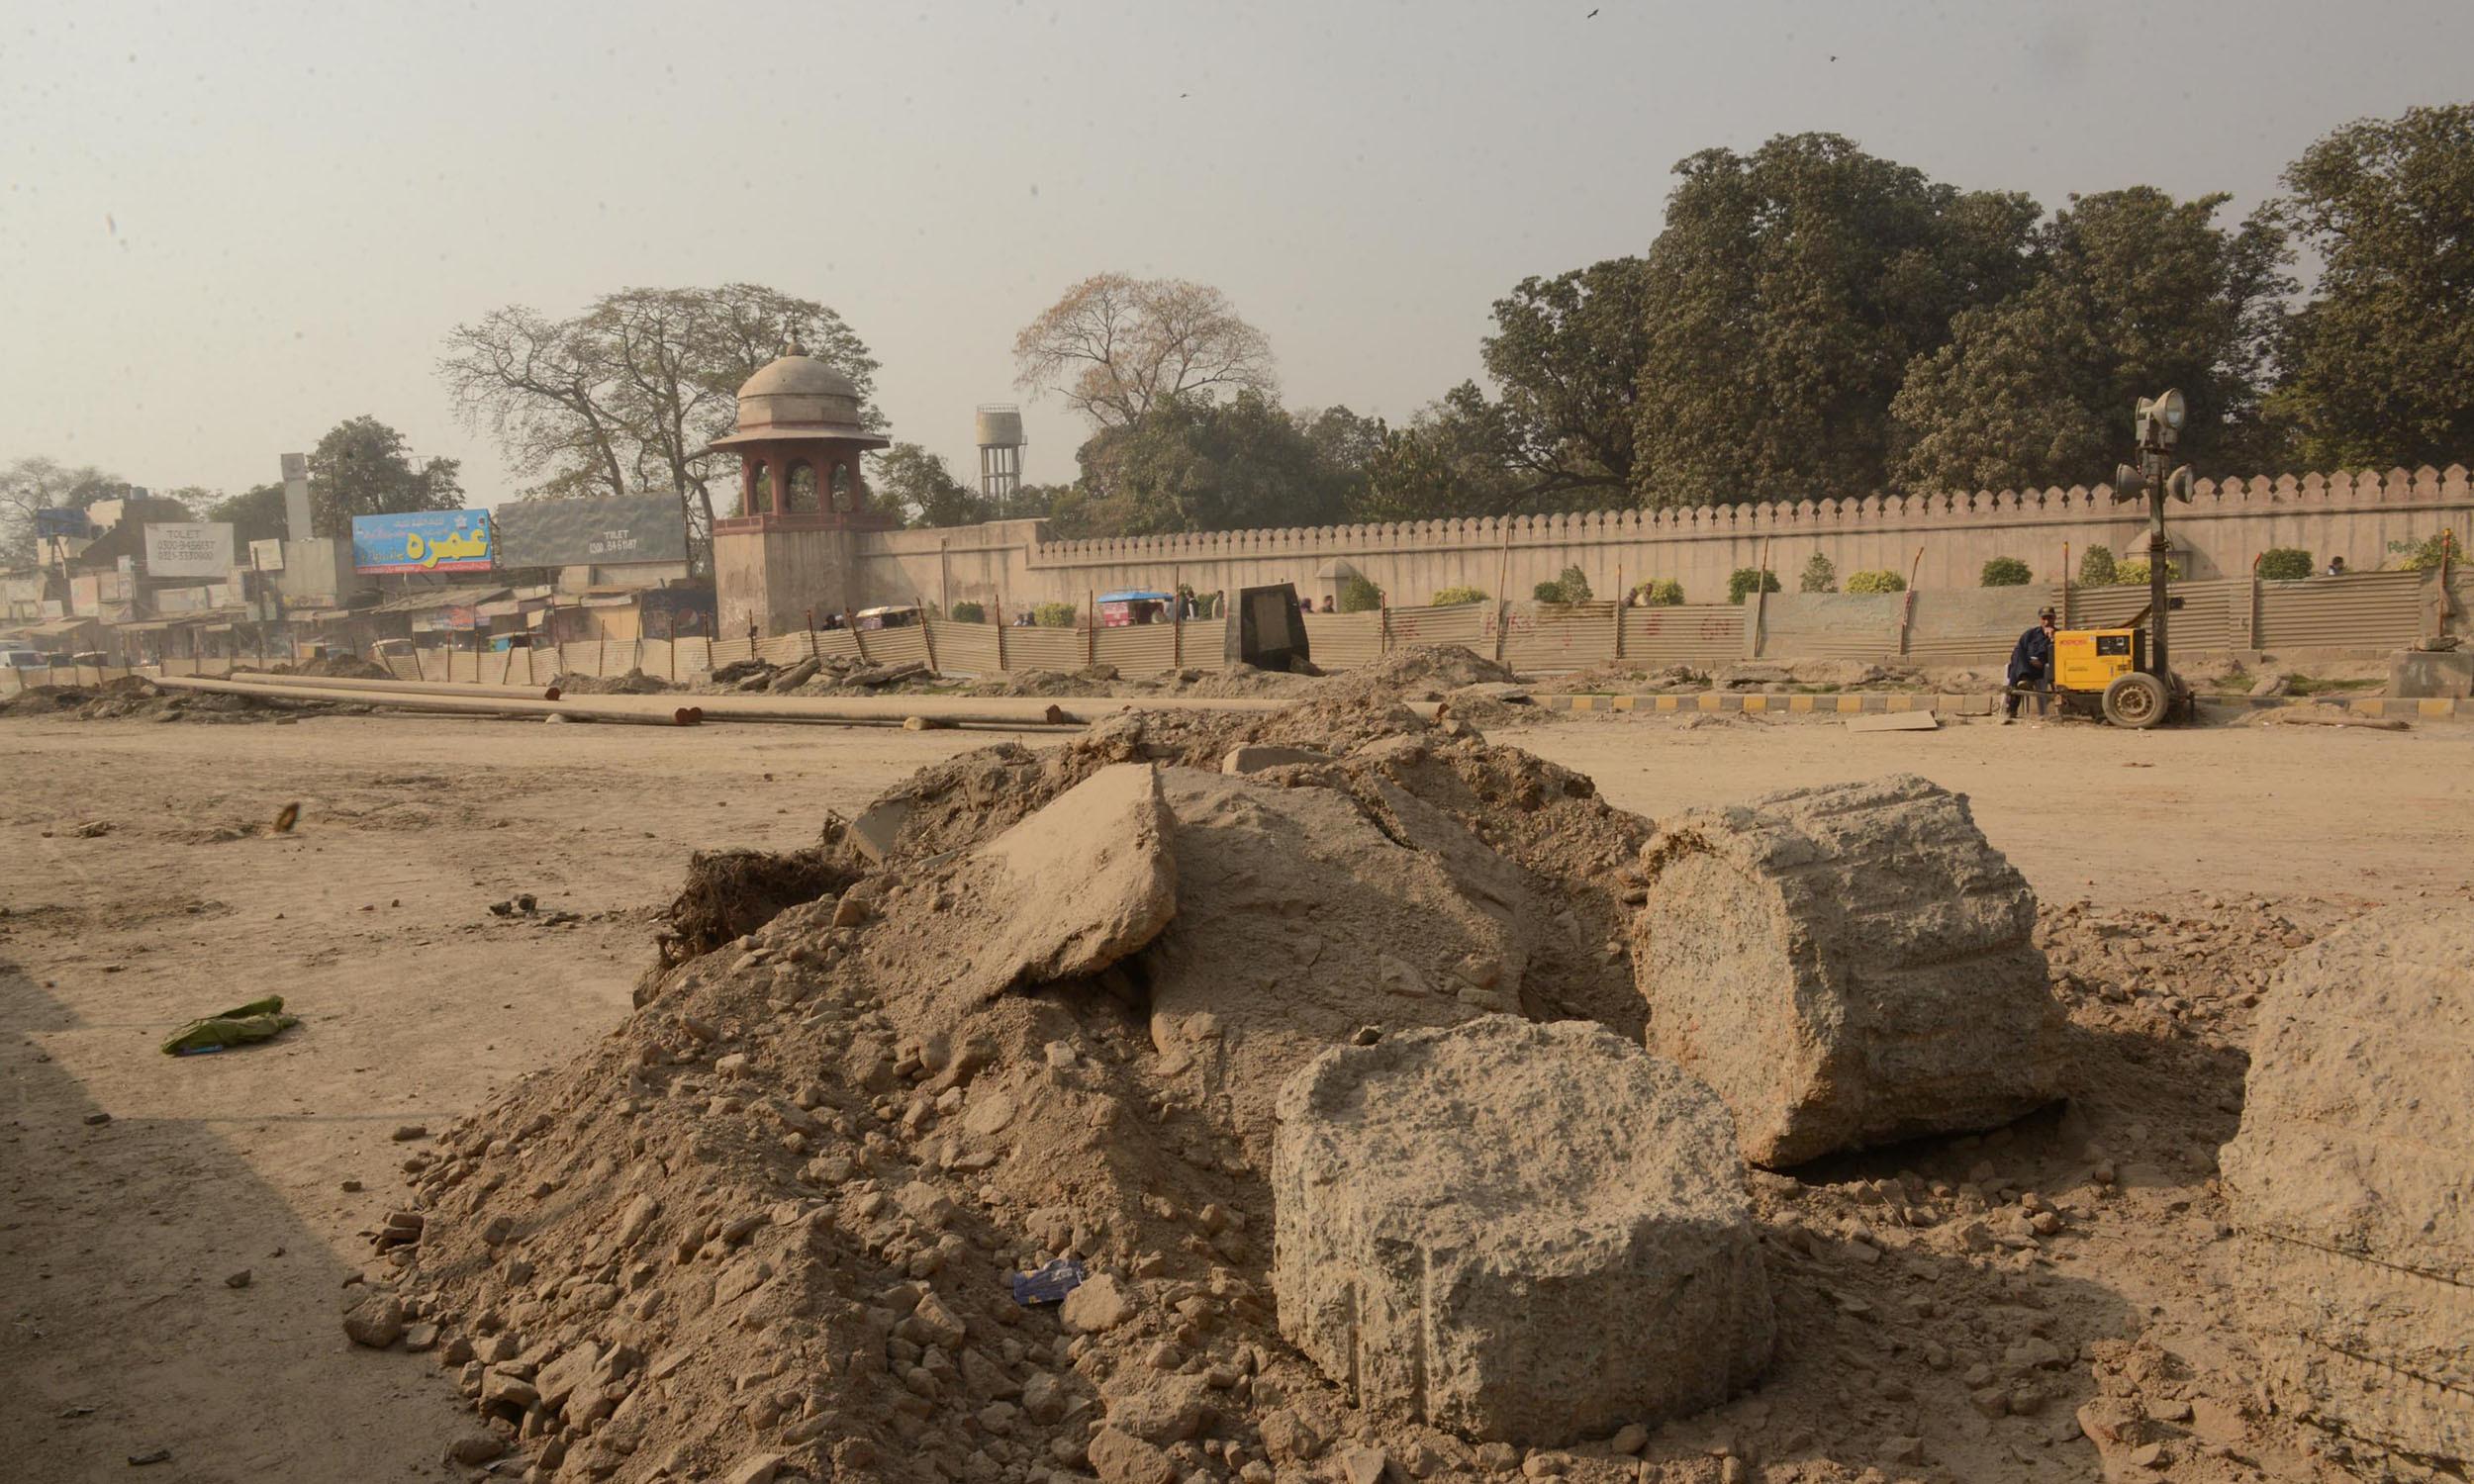 The site of a proposed Orange Line station near Shalimar Gardens | Azhar Jafferi, White Star